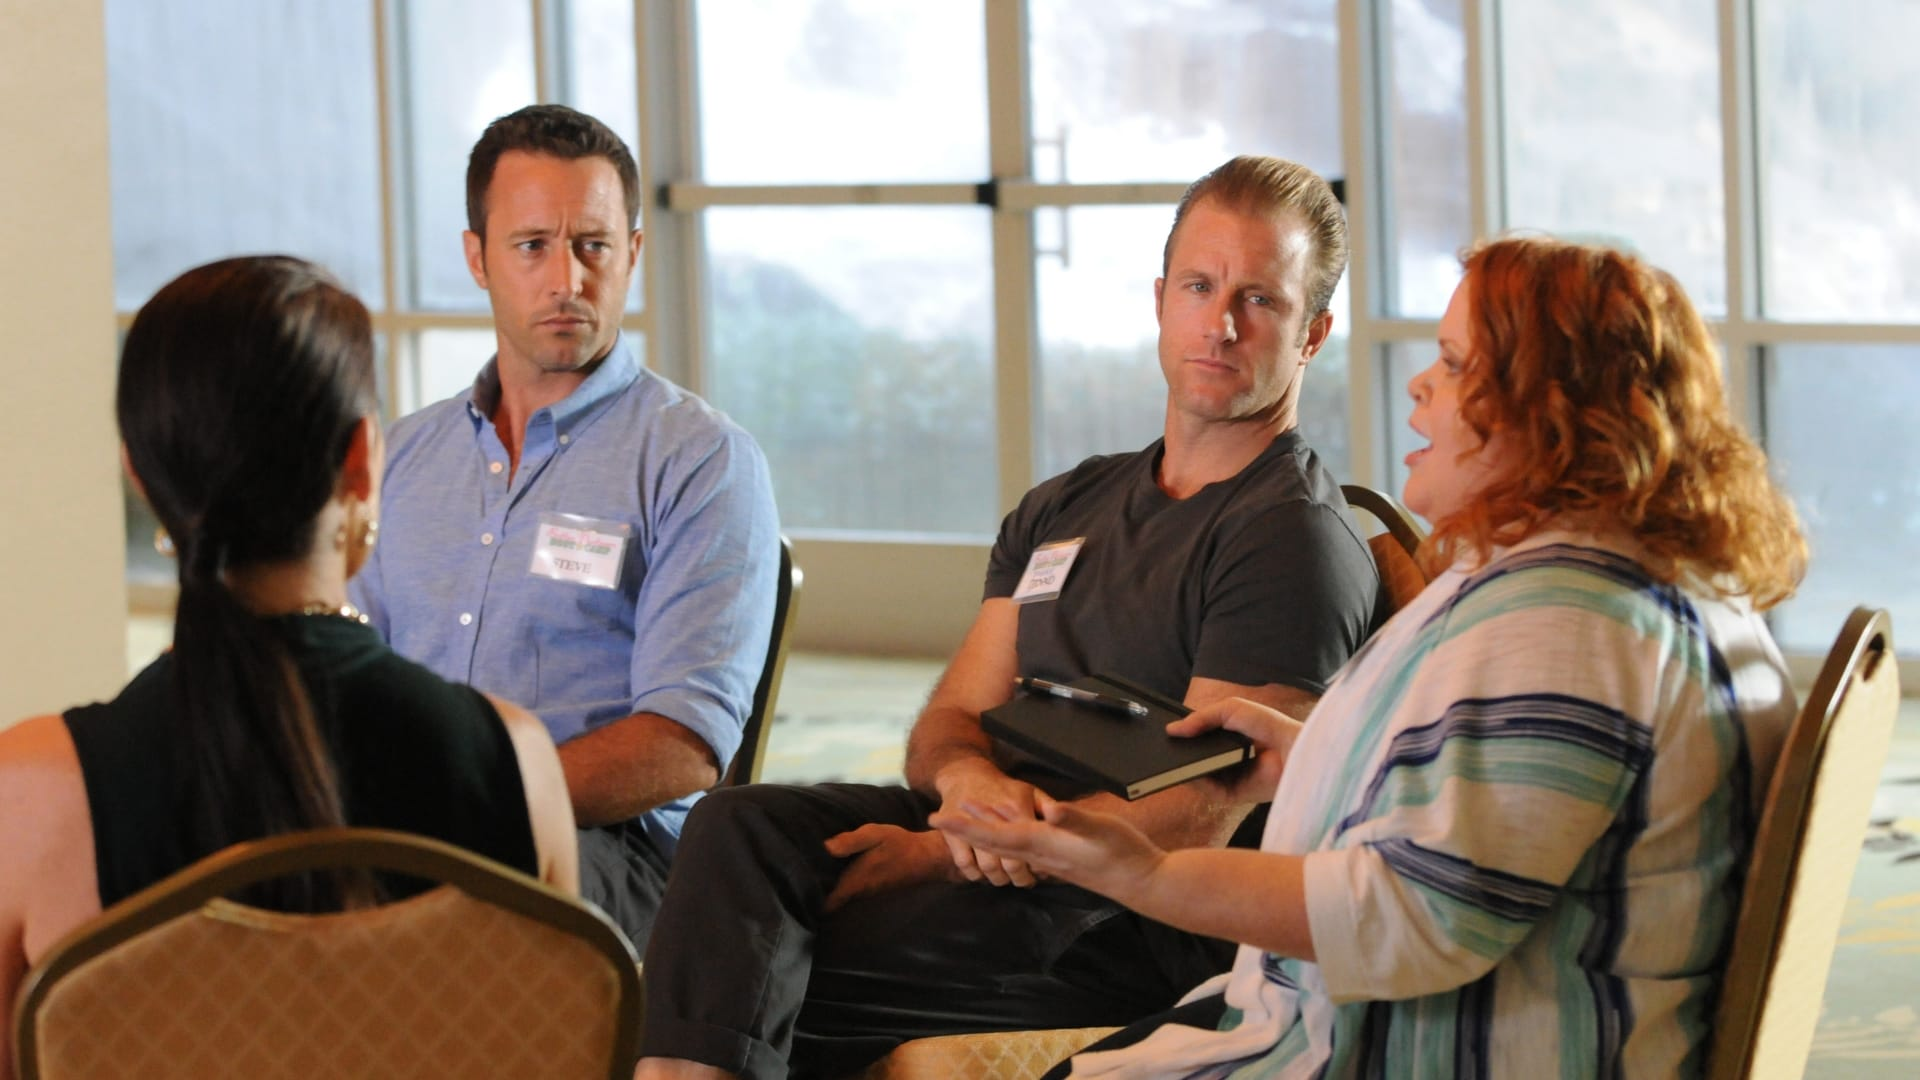 Hawaii Five-0 - Season 6 Episode 11 : Kuleana (One's Personal Sense of Responsibility)